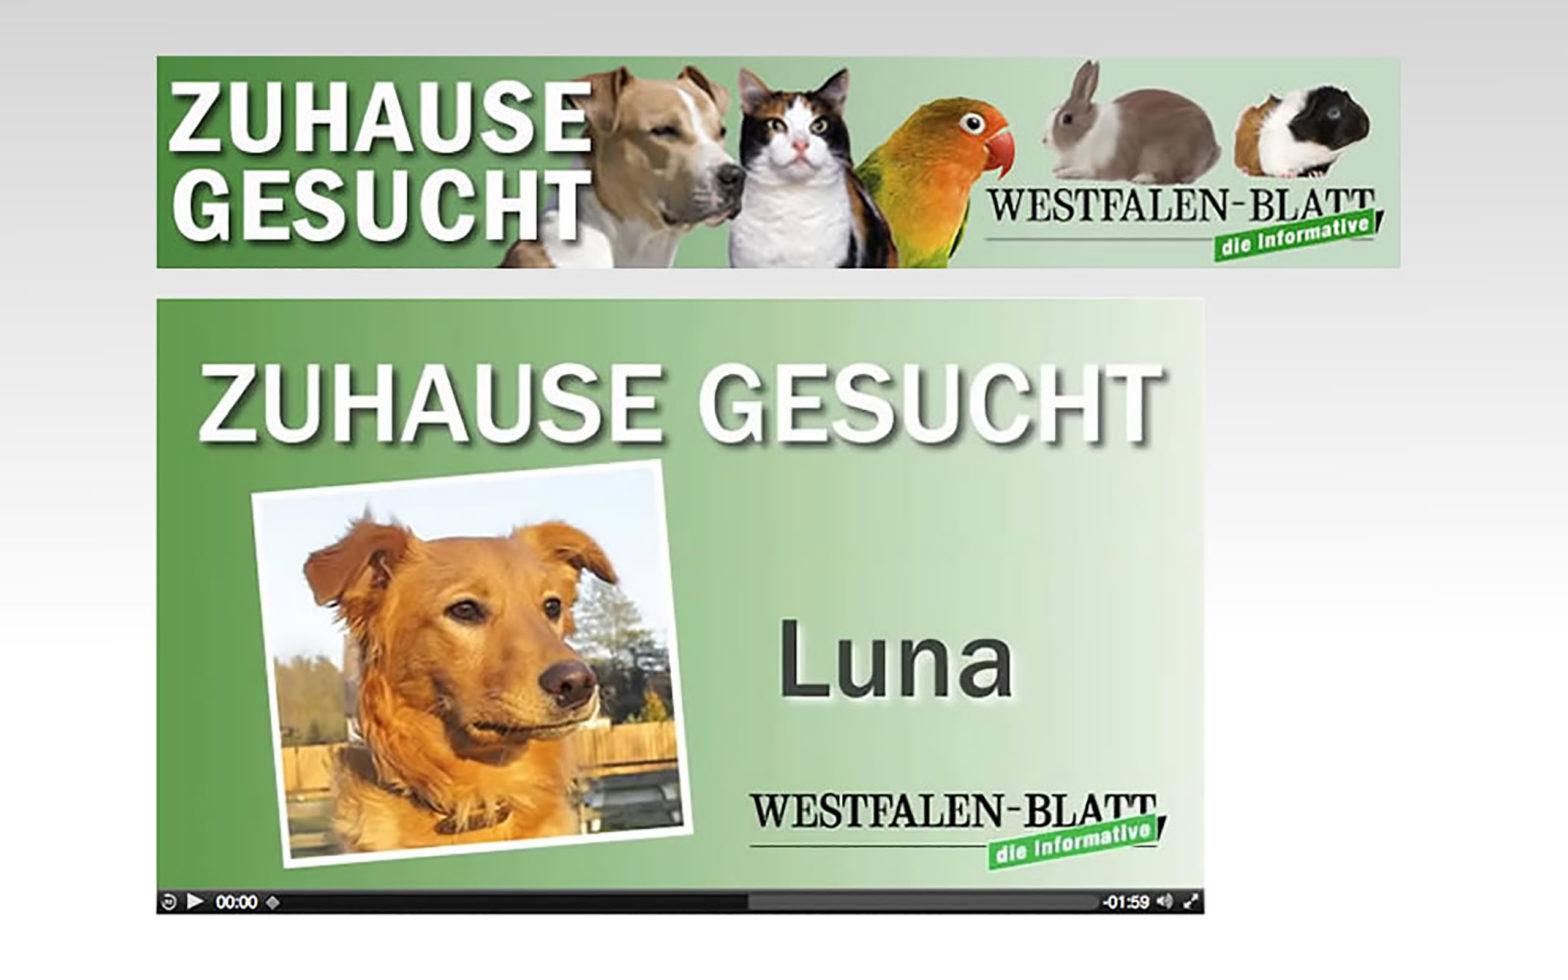 WESTFALEN-BLATT Zuhause gesucht